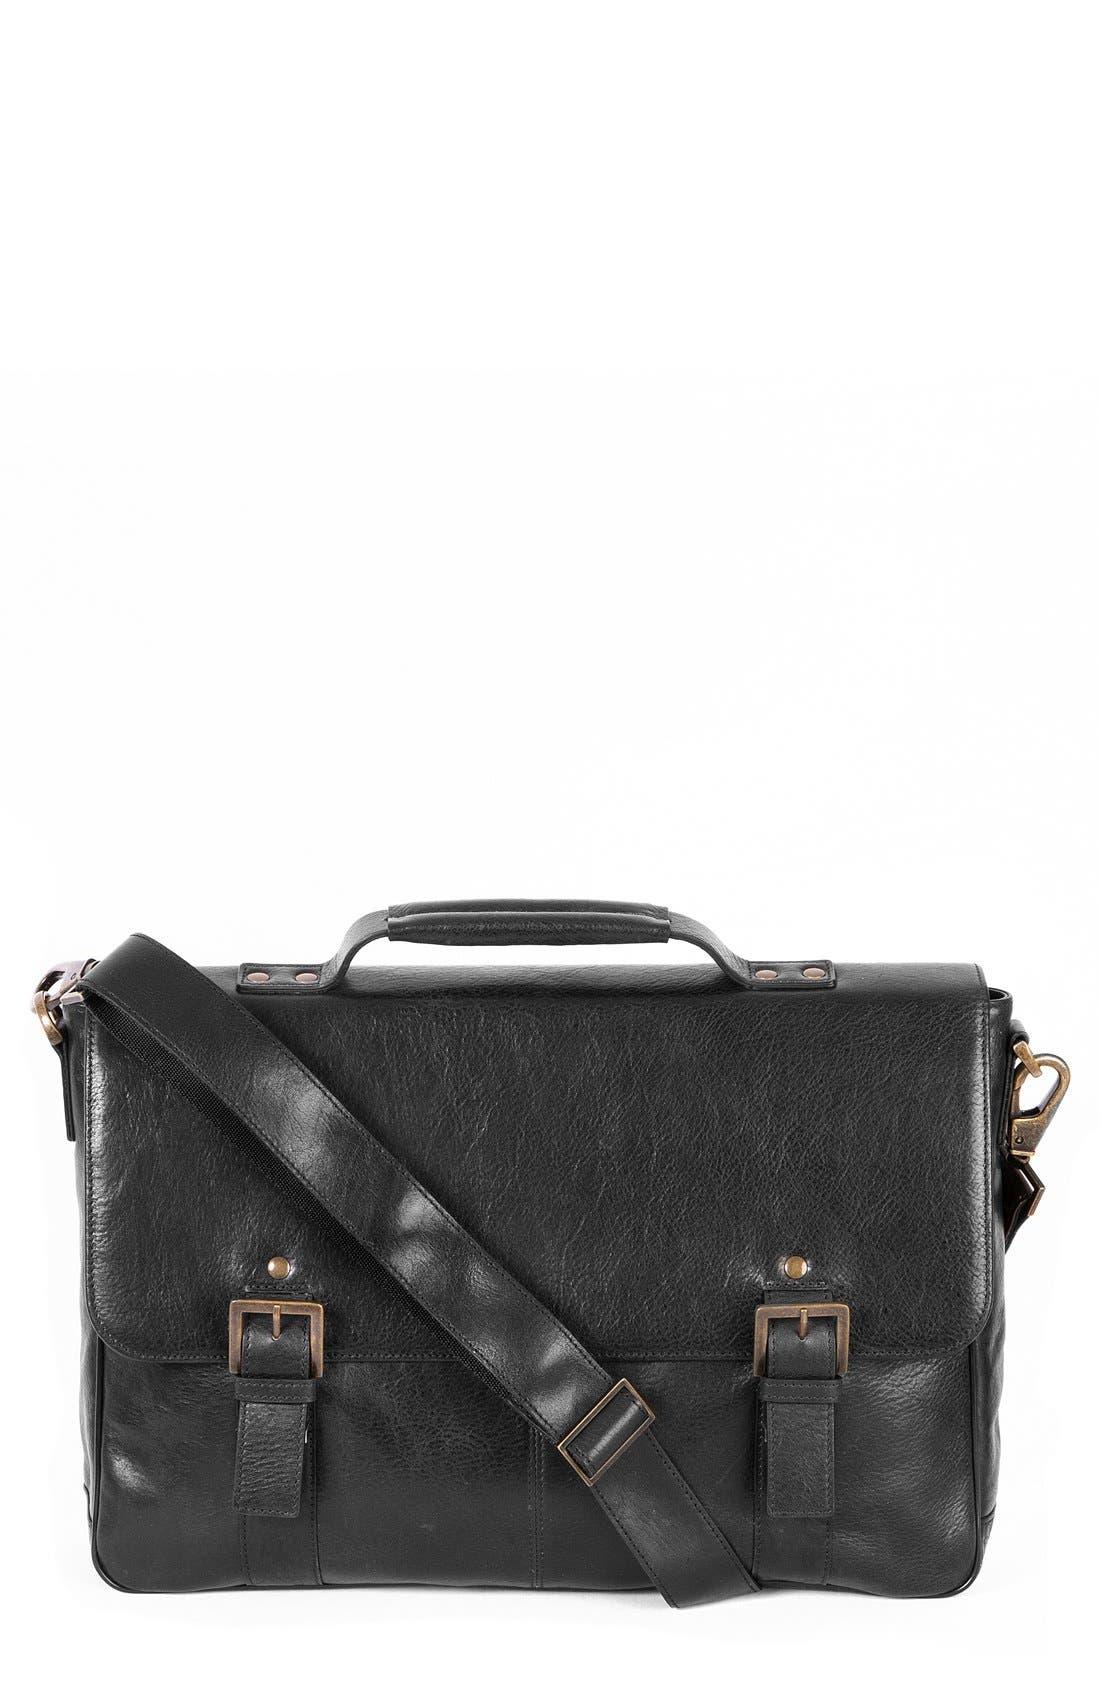 'Becker' Leather Messenger Bag,                             Main thumbnail 1, color,                             BLACK W/ KHAKI